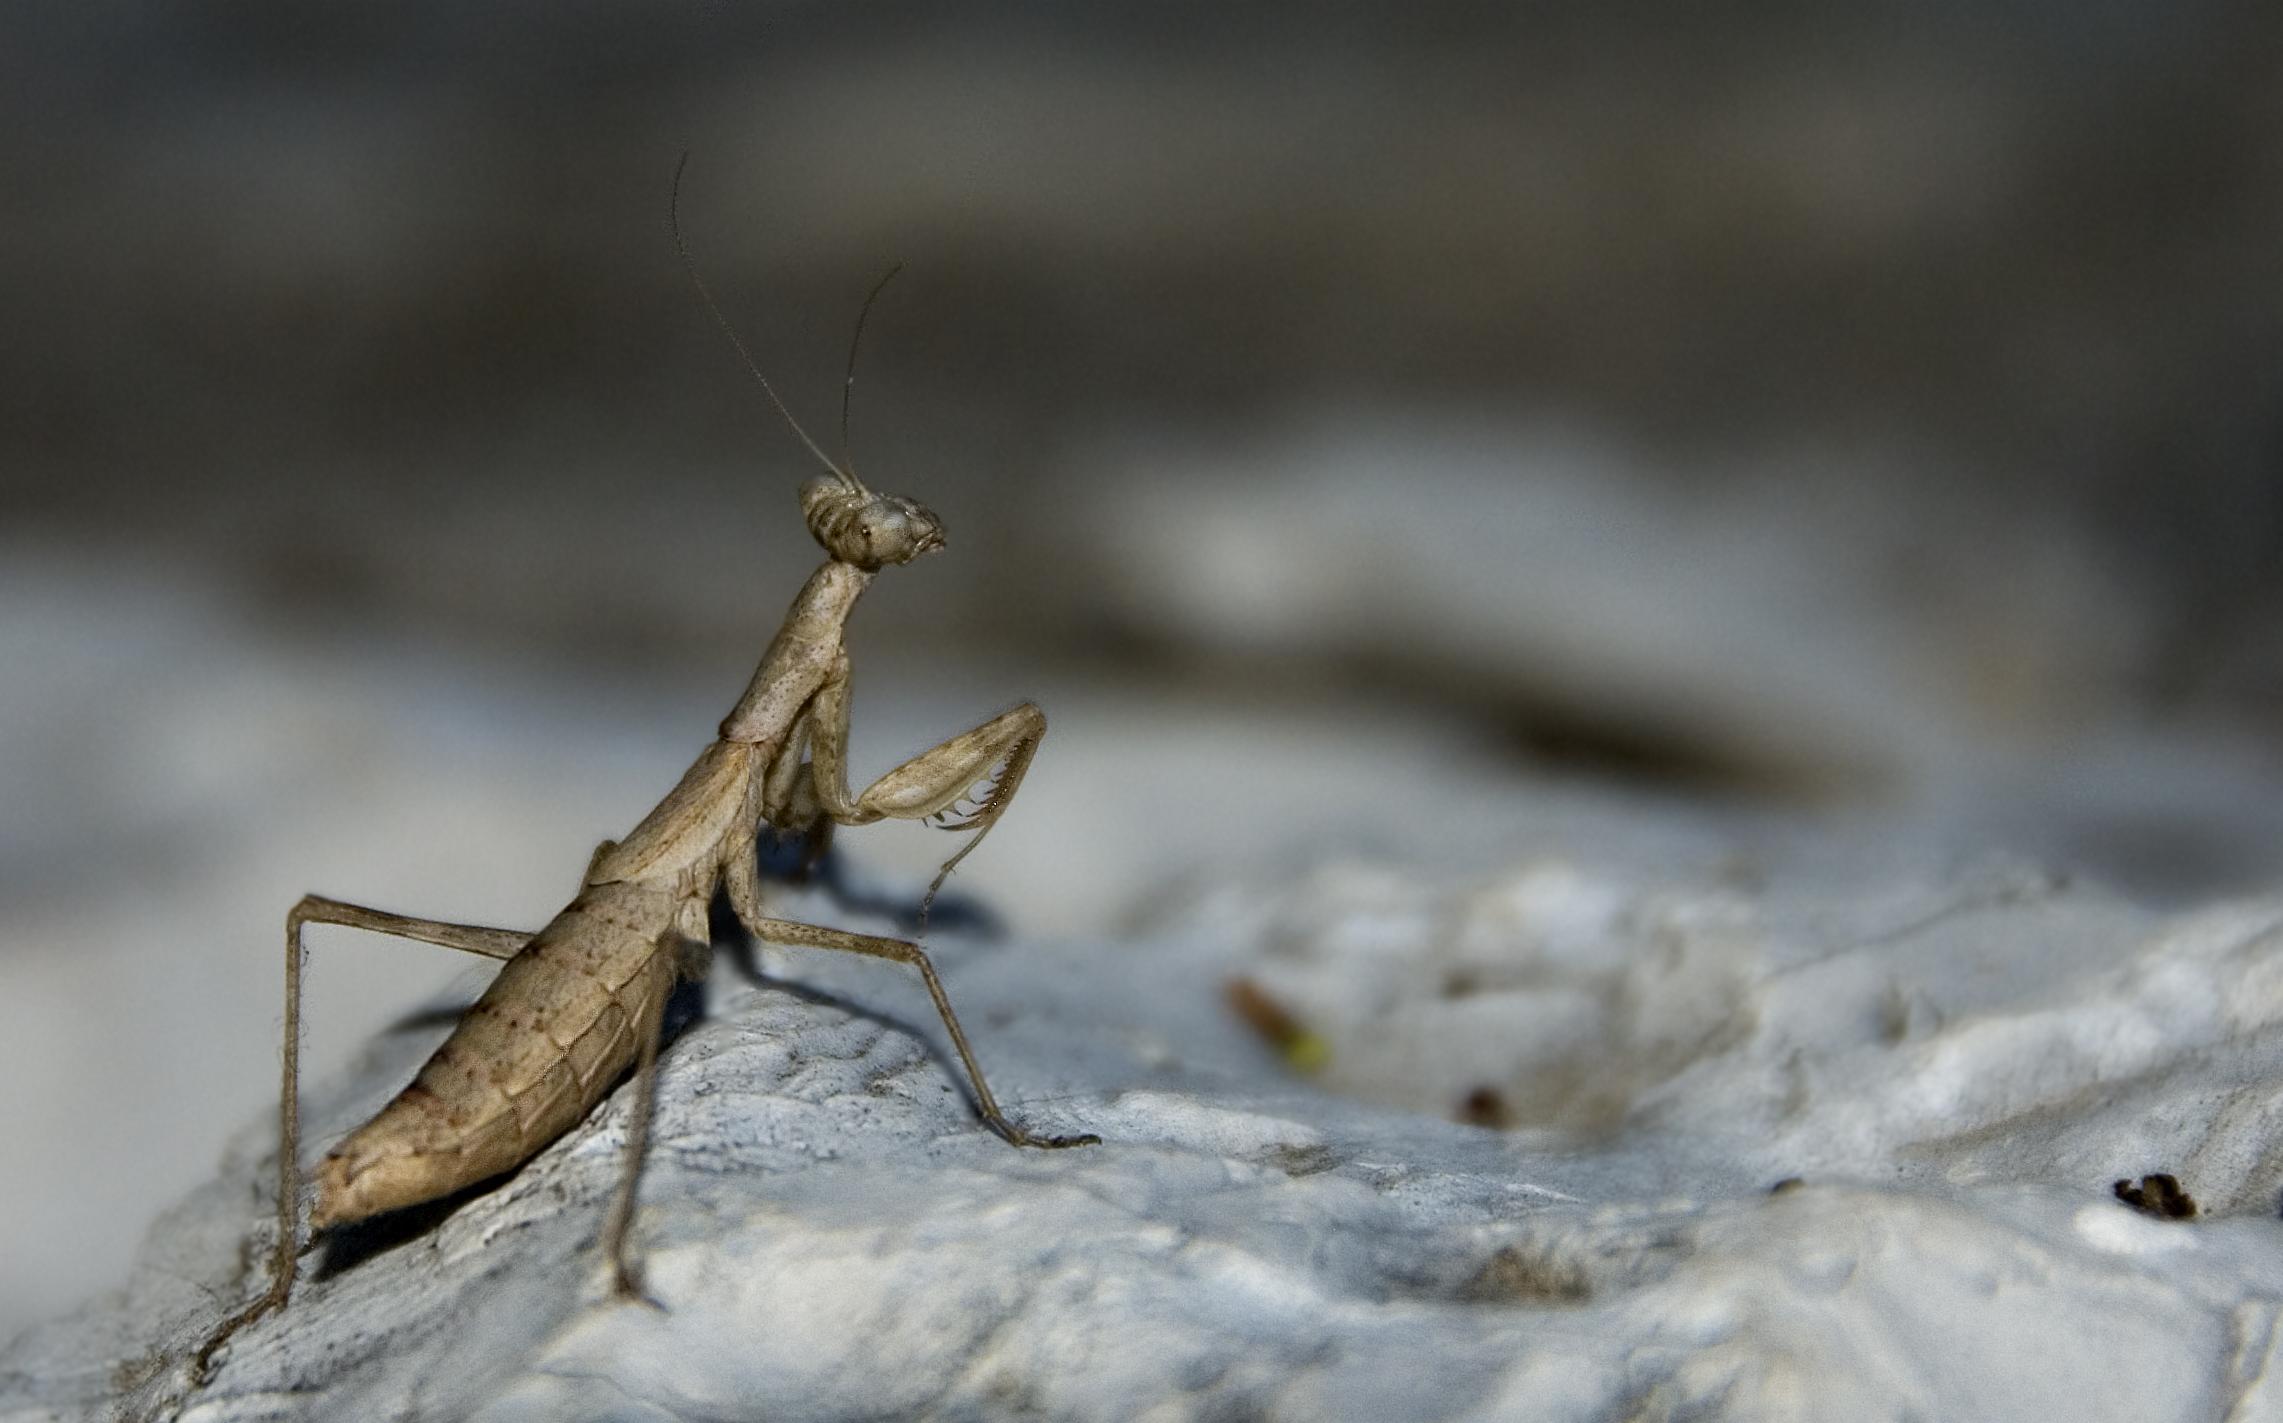 Mantis - Kefallonia